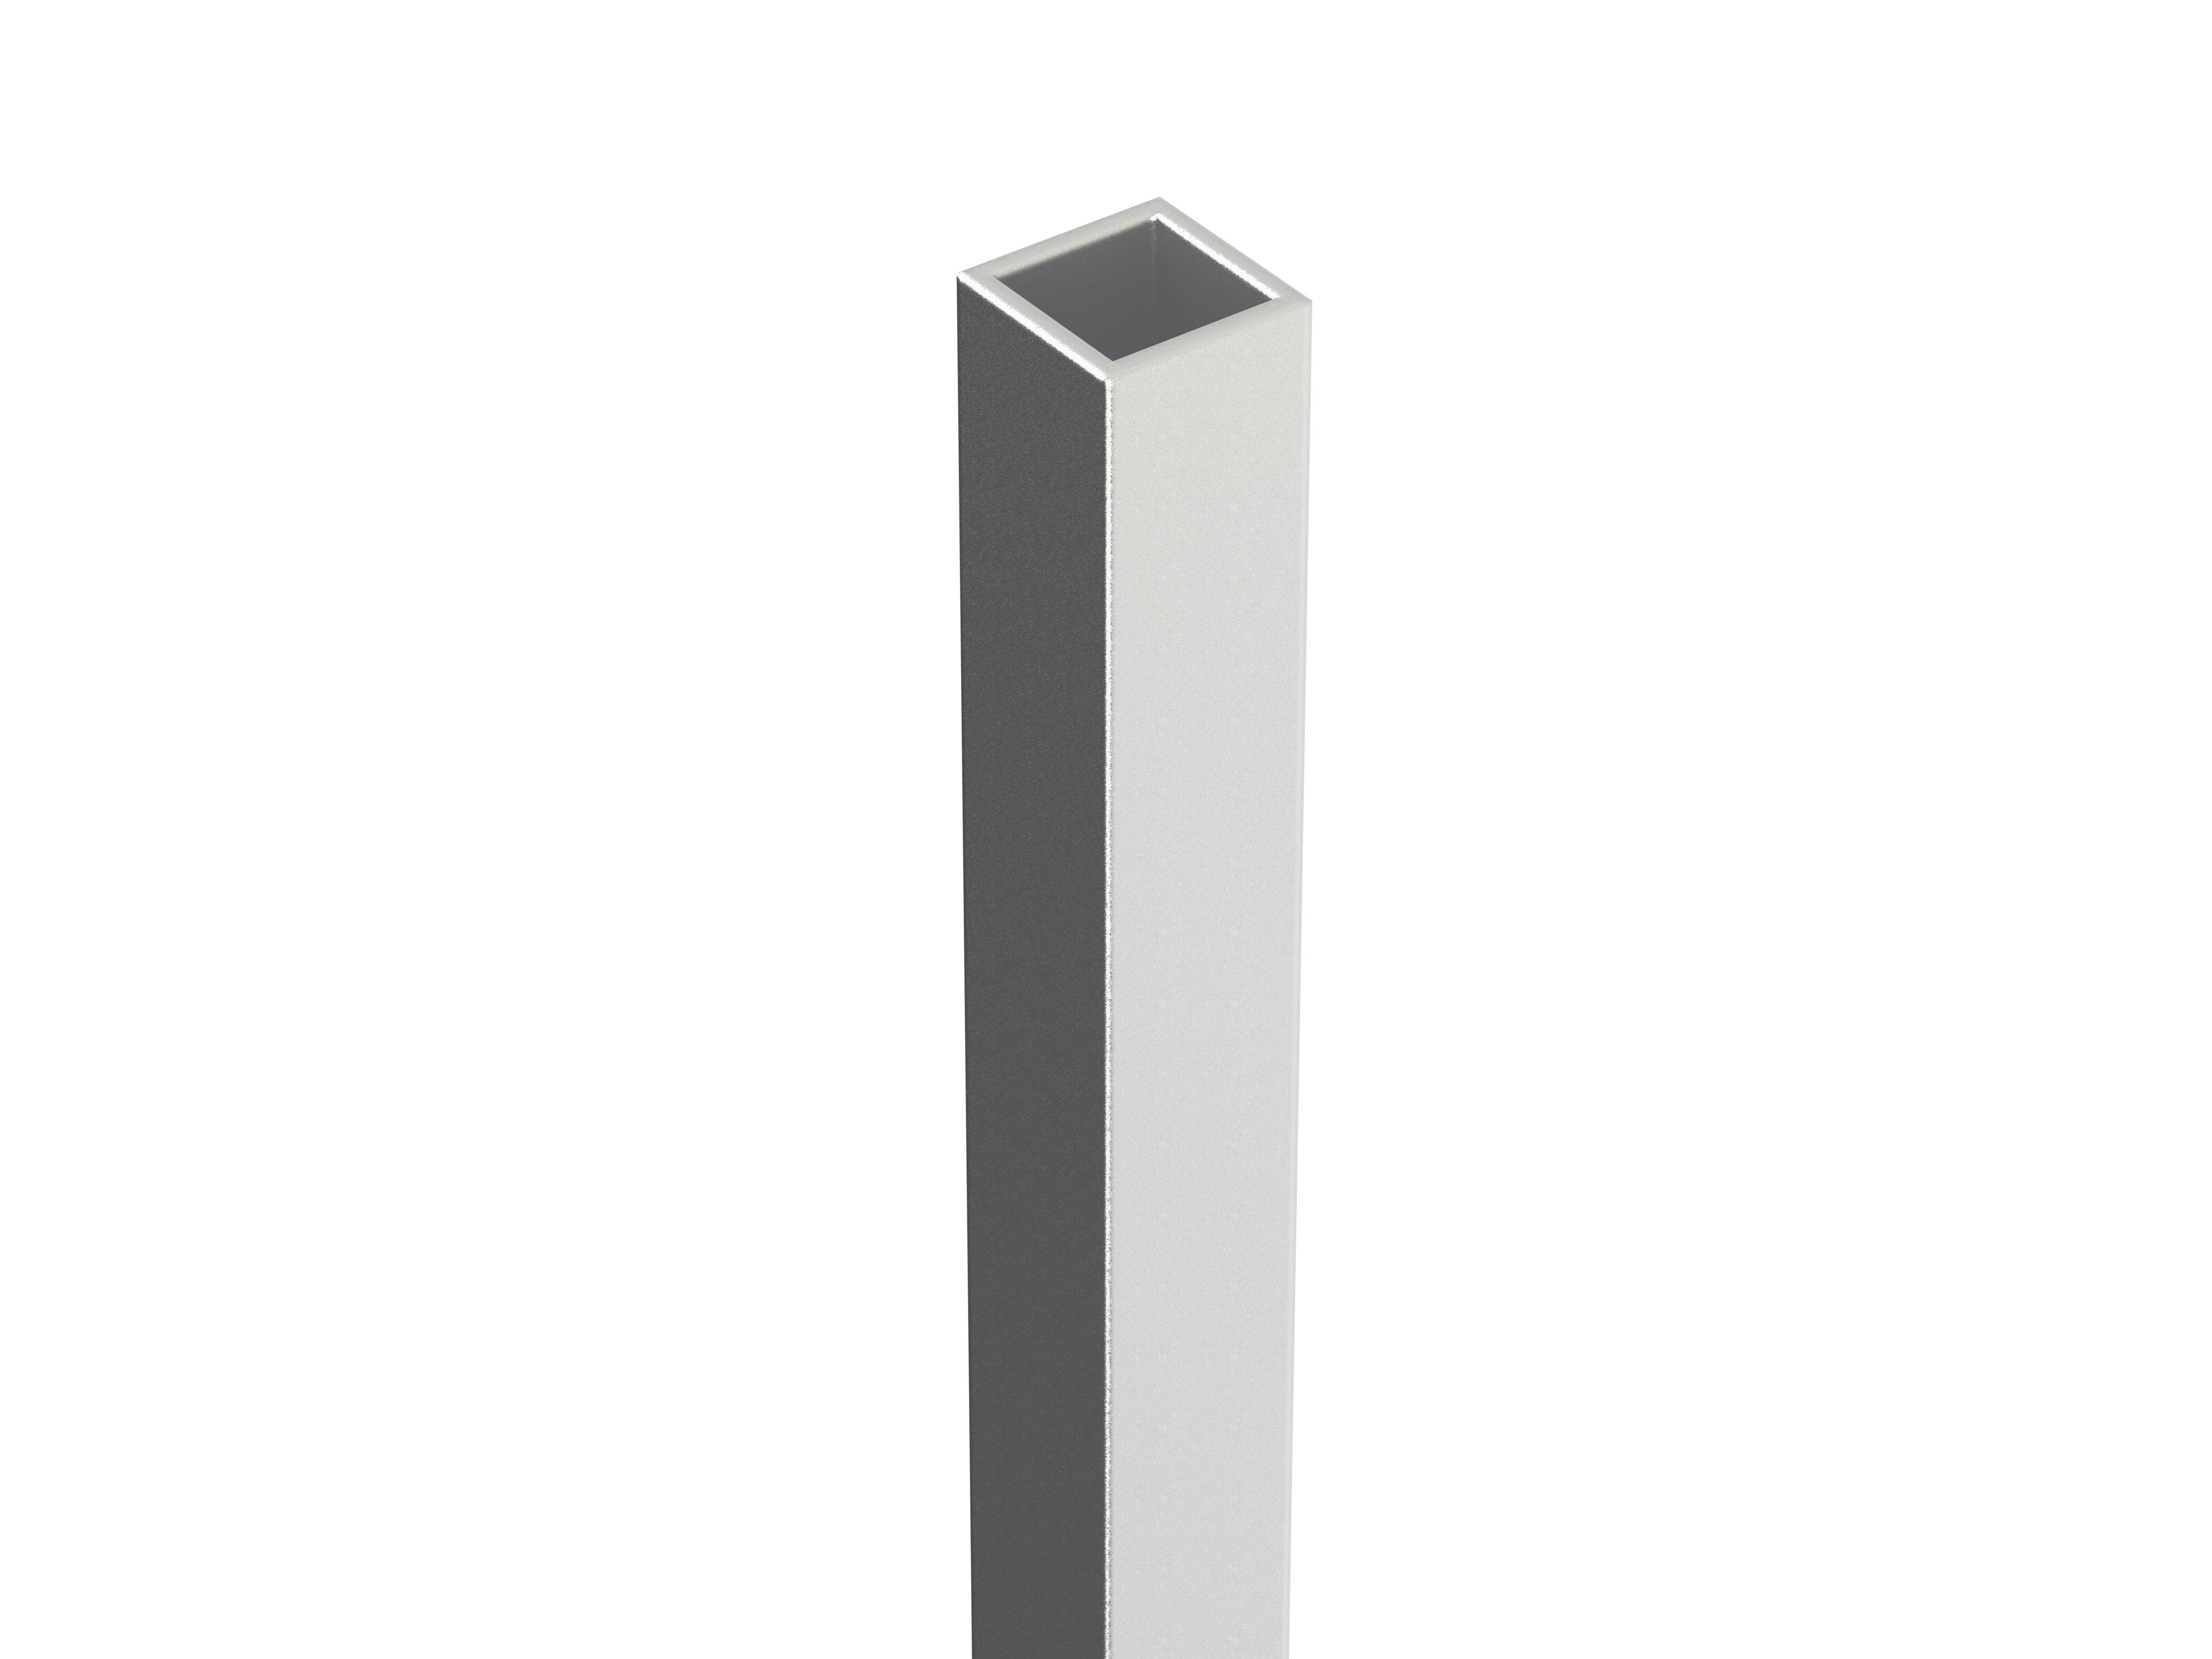 1 Stk Pendel für Design OM 500mm Aluminium verdrahtet NLOM1PA---